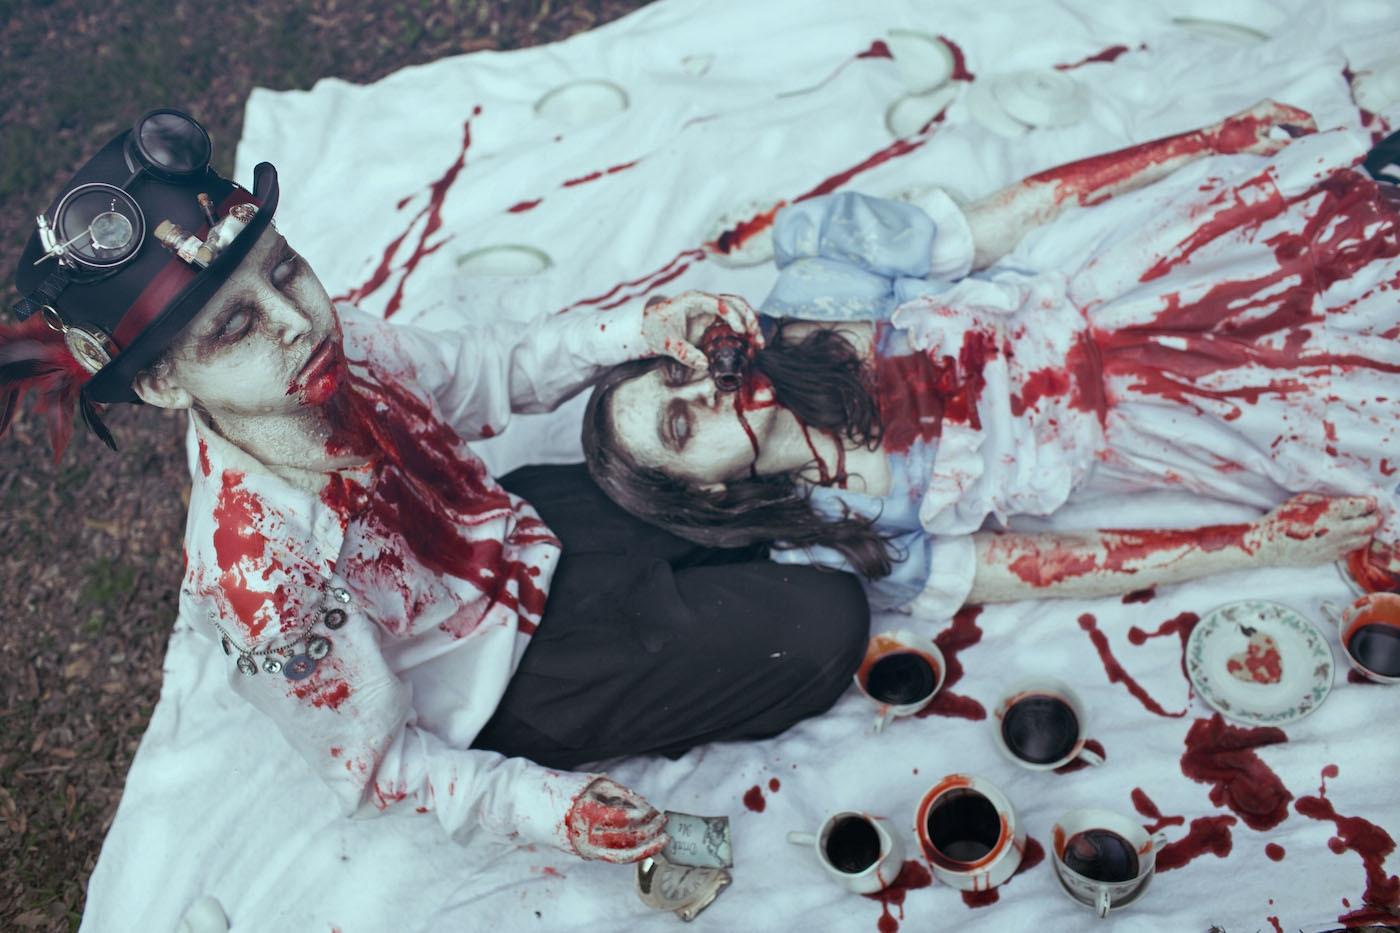 photographs-of-child-zombies-601-body-image-1433189272.jpg